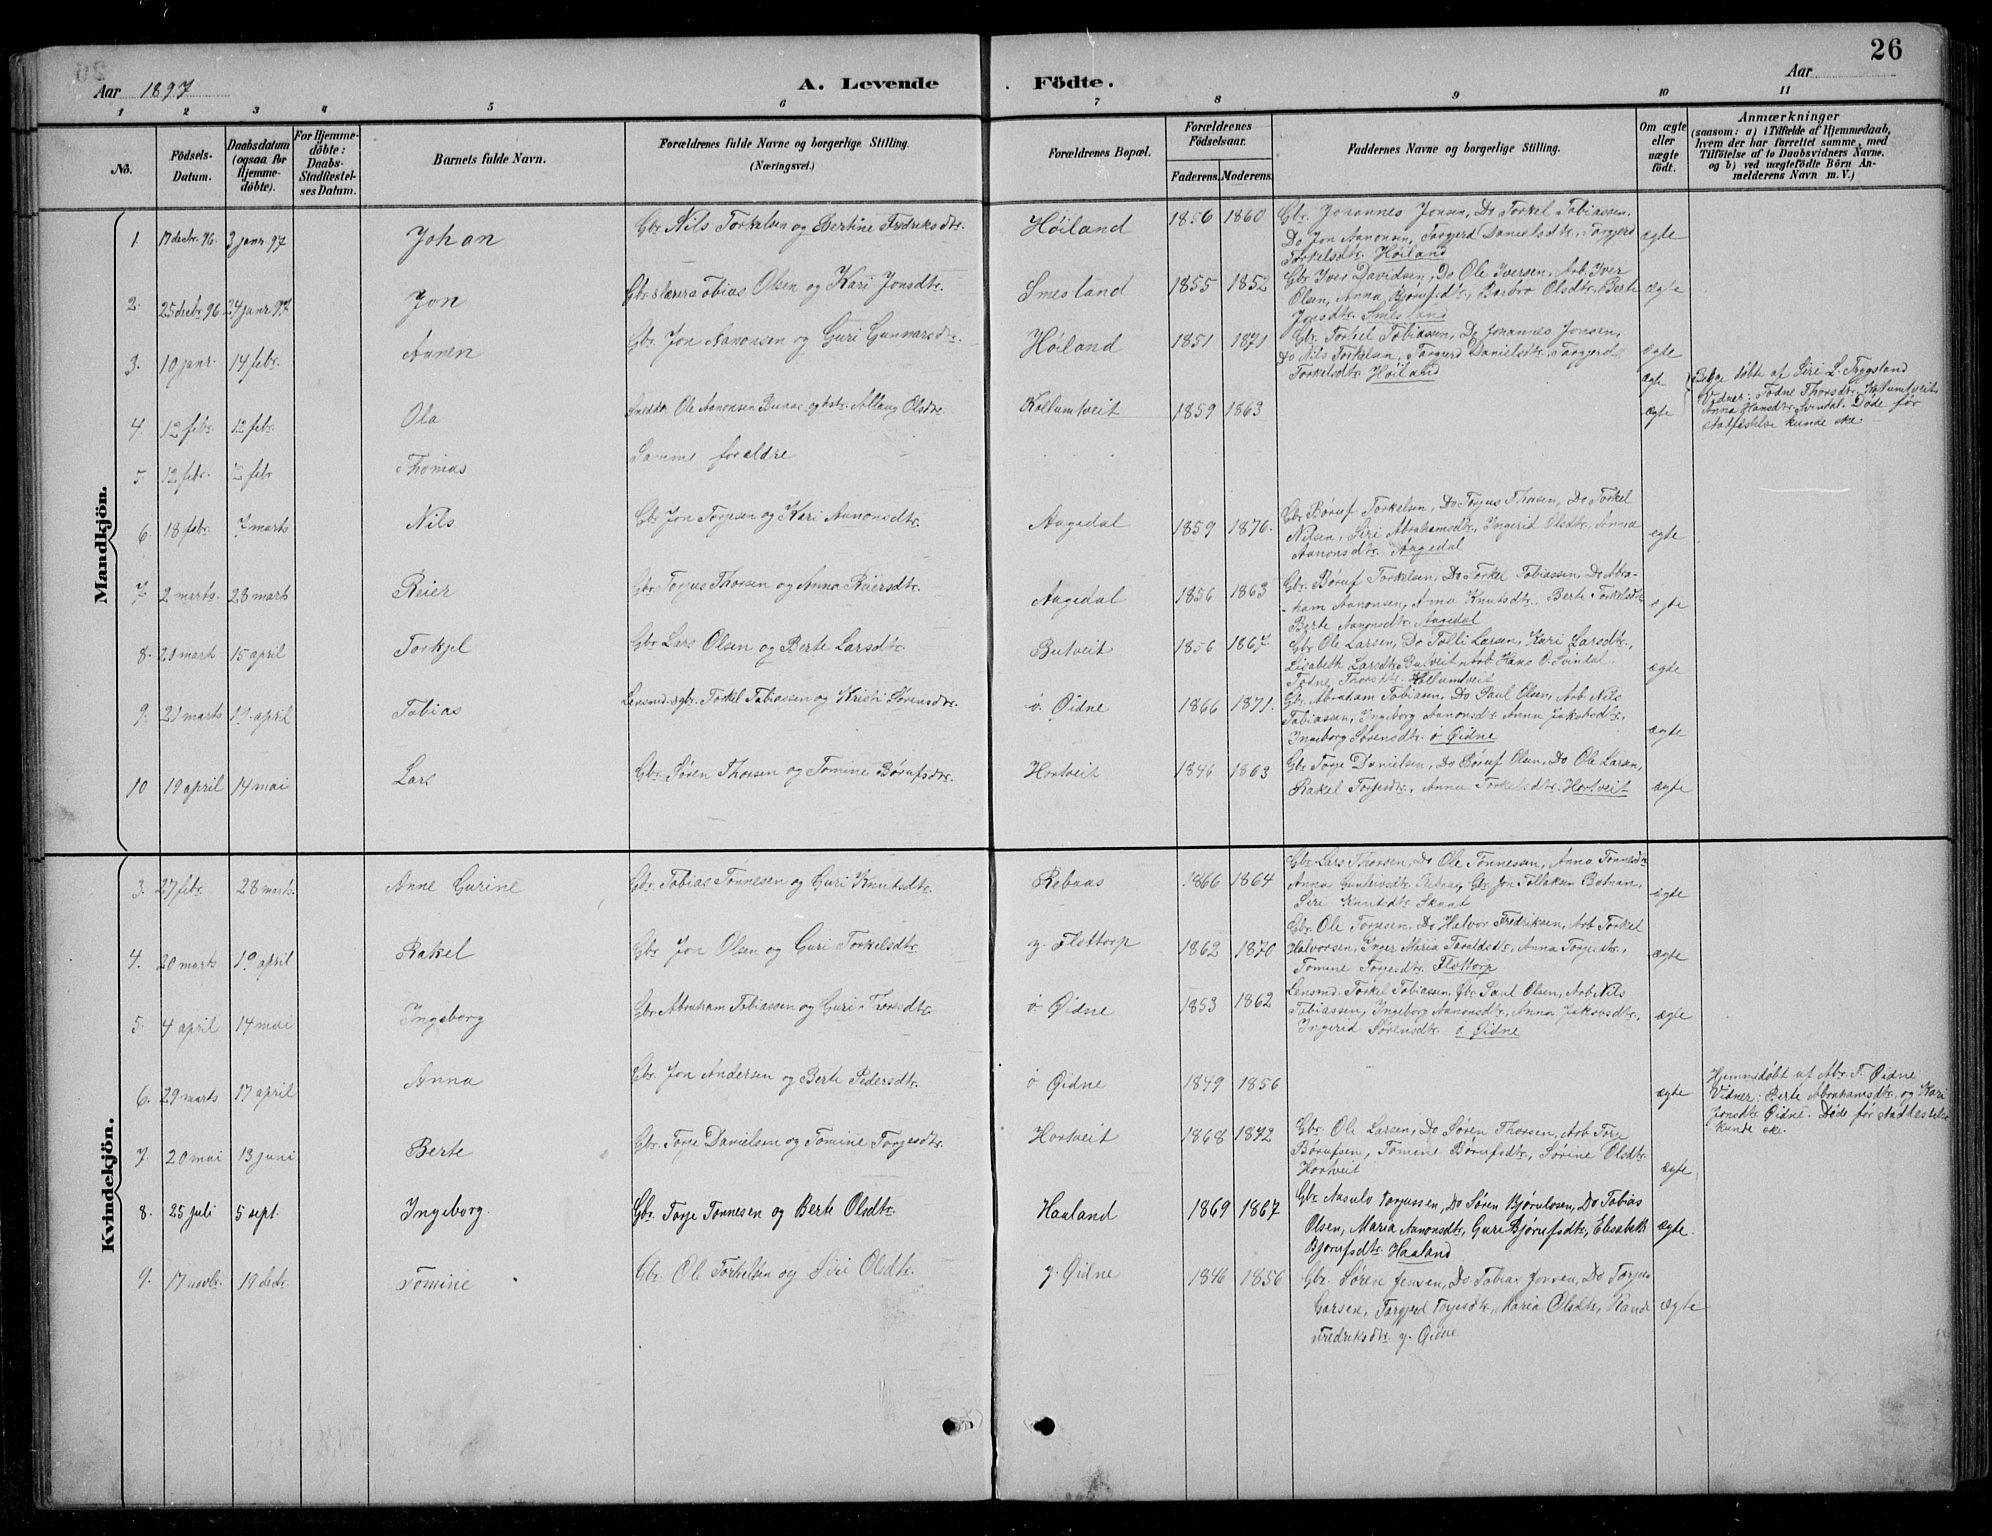 SAK, Bjelland sokneprestkontor, F/Fb/Fbc/L0003: Klokkerbok nr. B 3, 1887-1924, s. 26